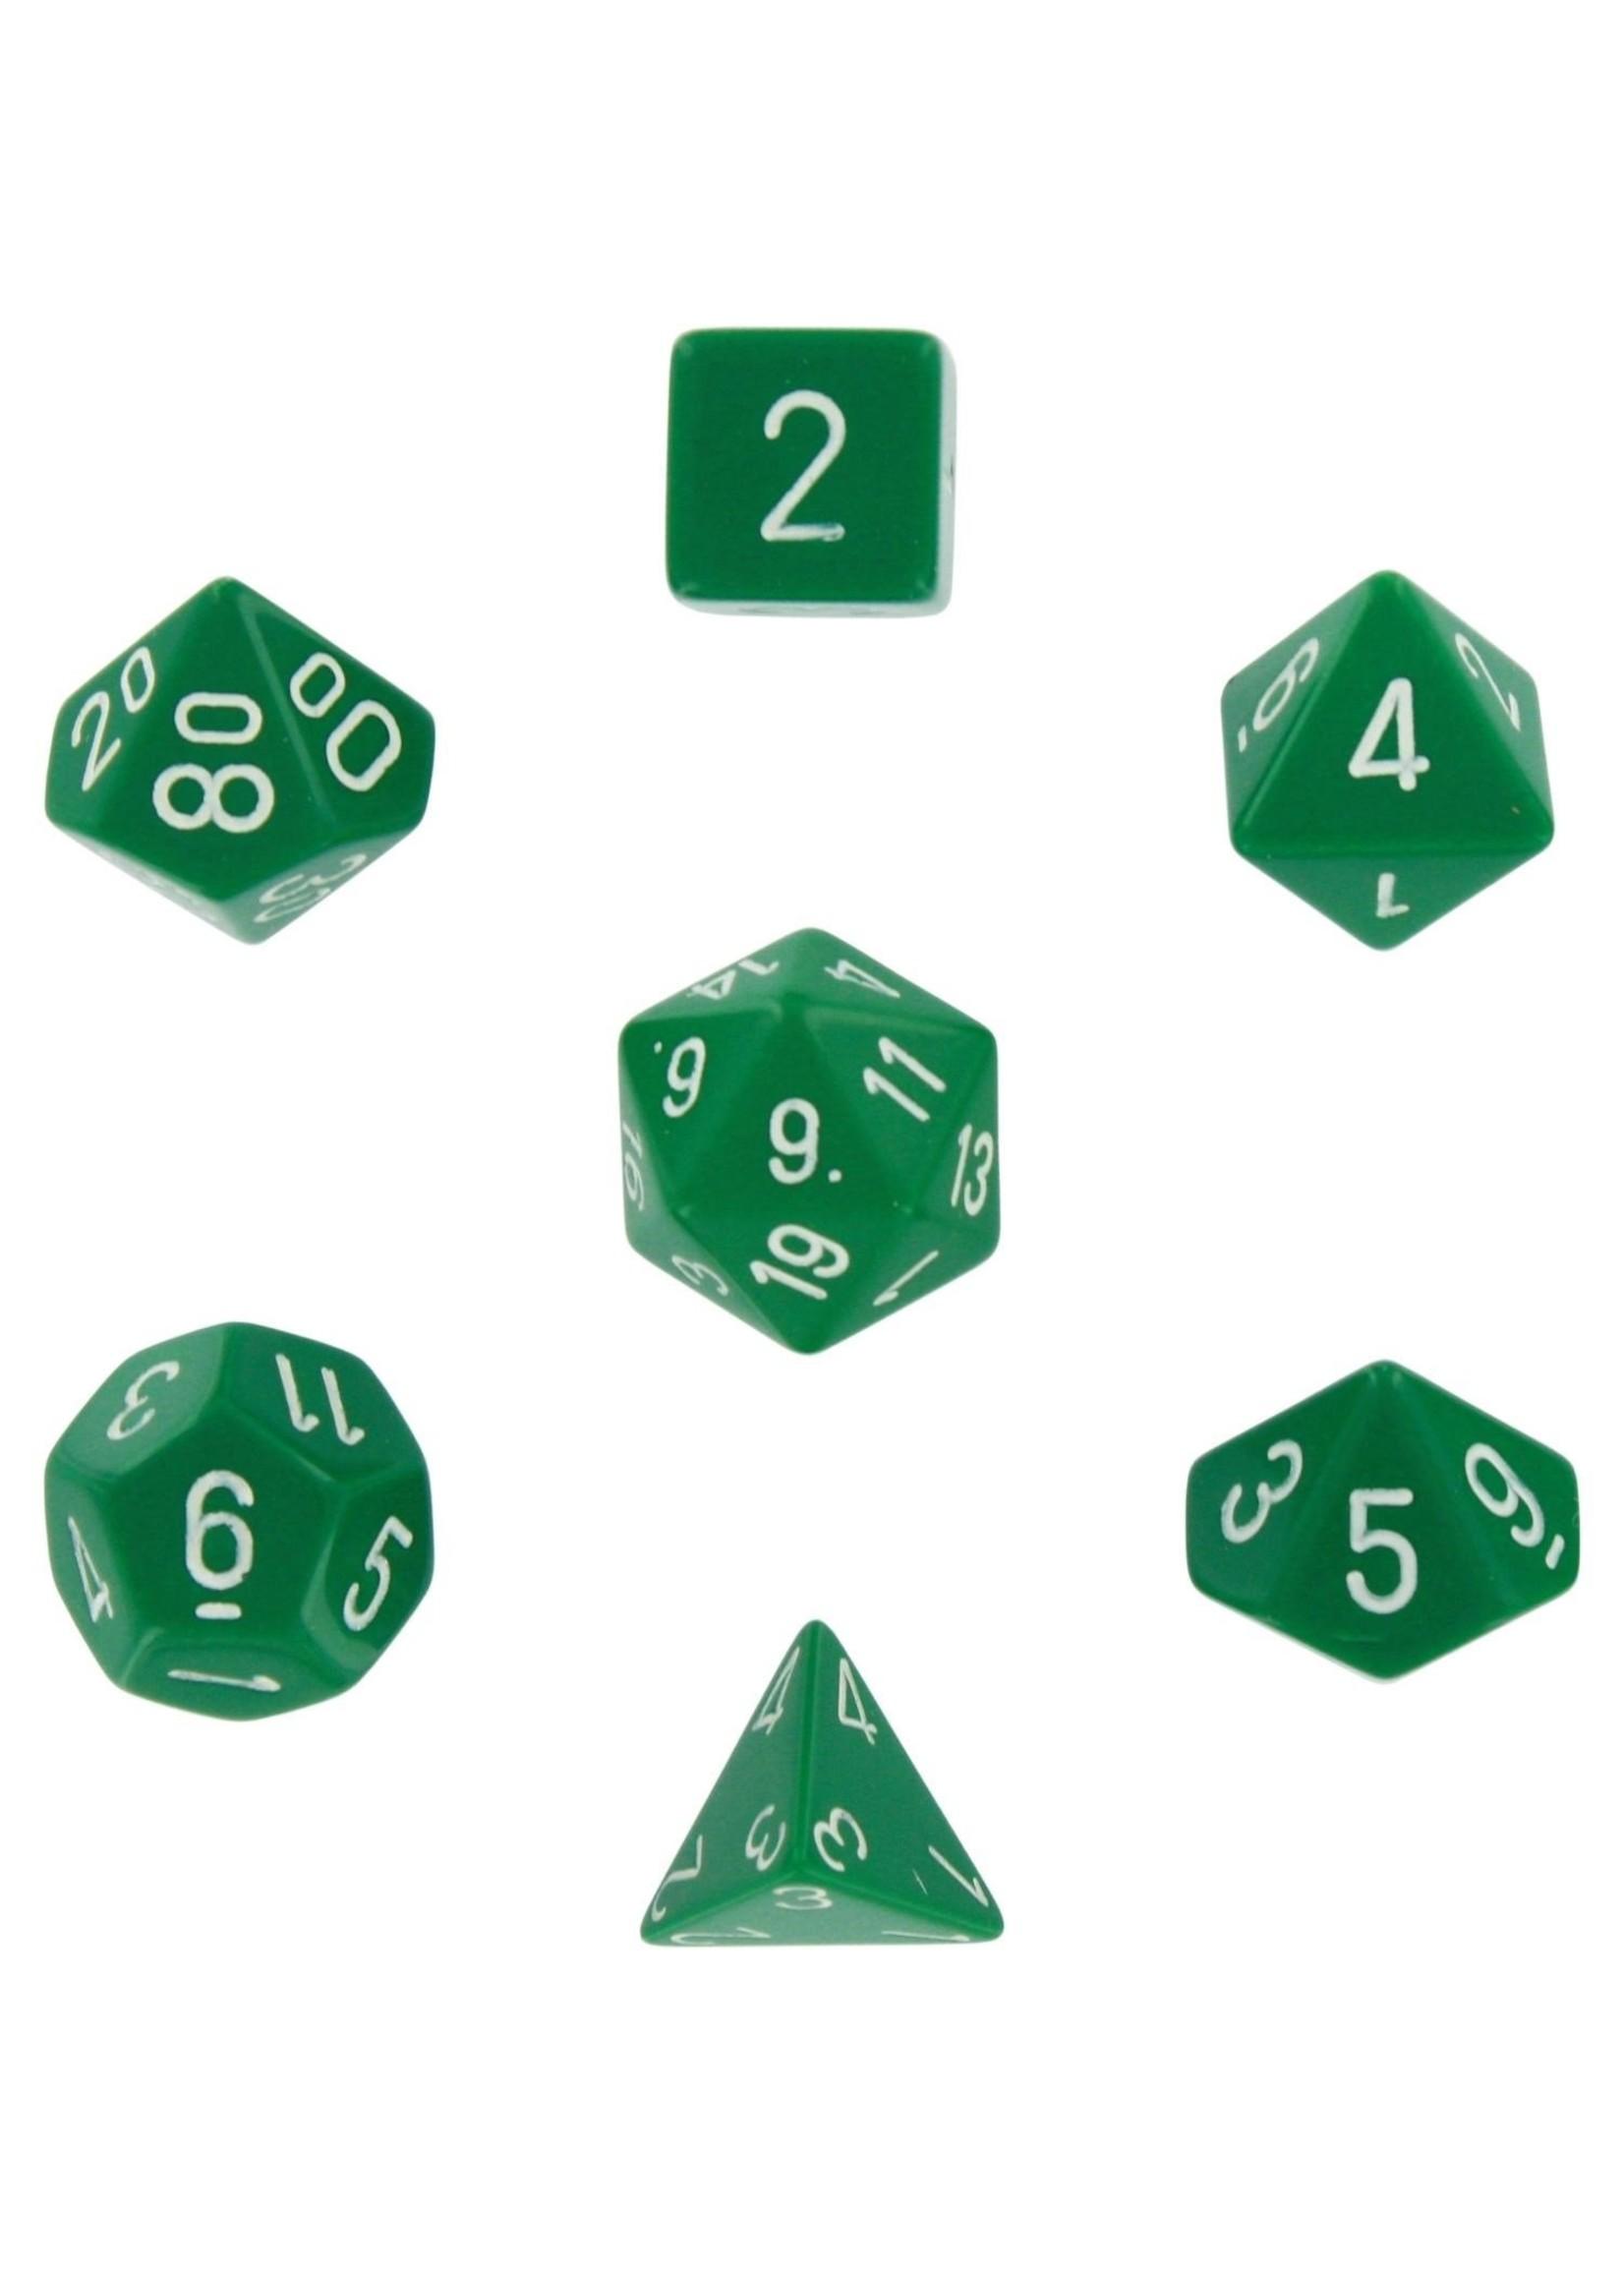 CHX 25405 Dice Green/white